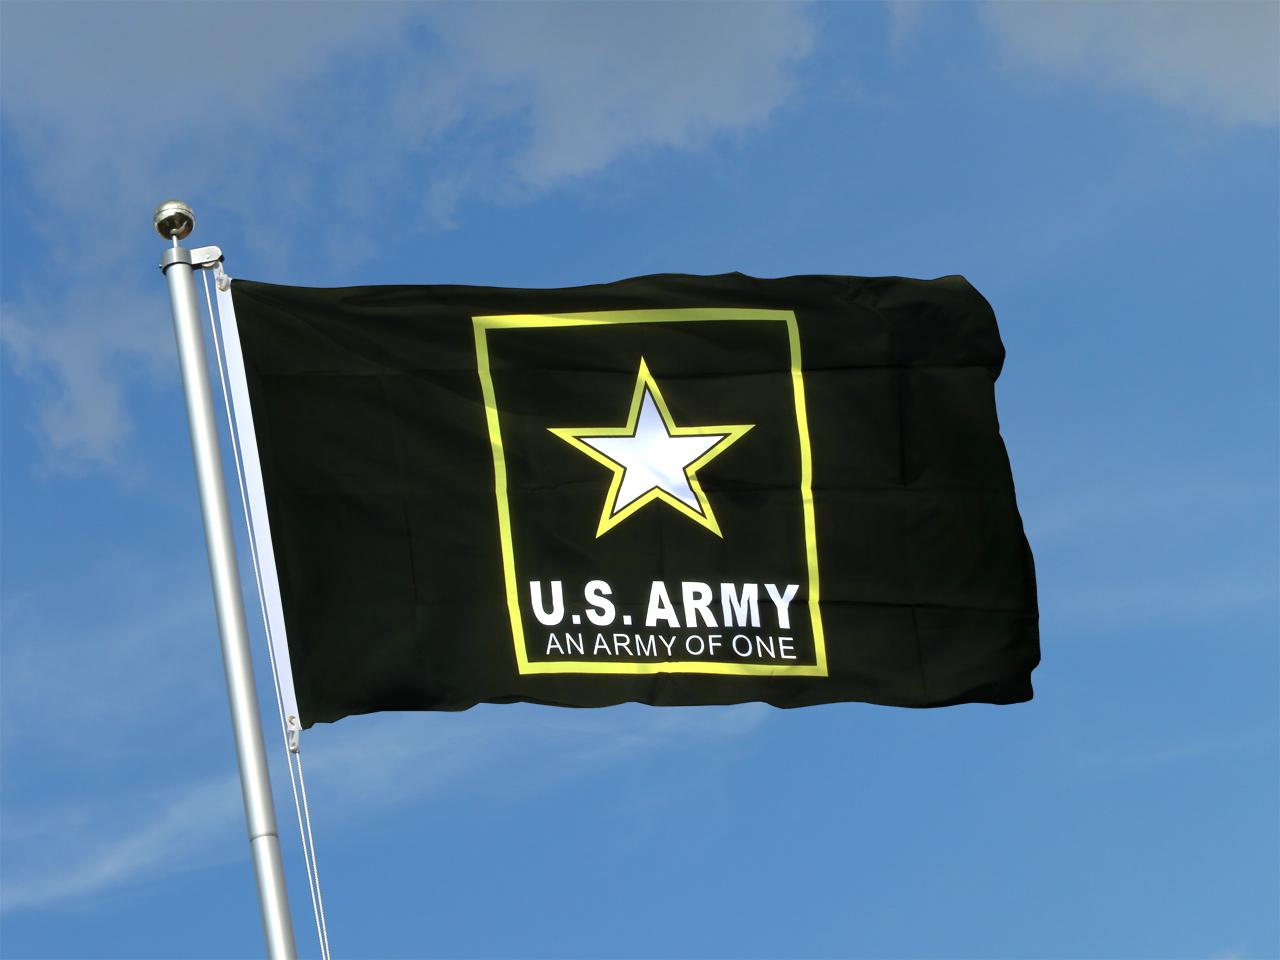 usa us army star flagge kaufen 90 x 150 cm flaggenplatz shop. Black Bedroom Furniture Sets. Home Design Ideas